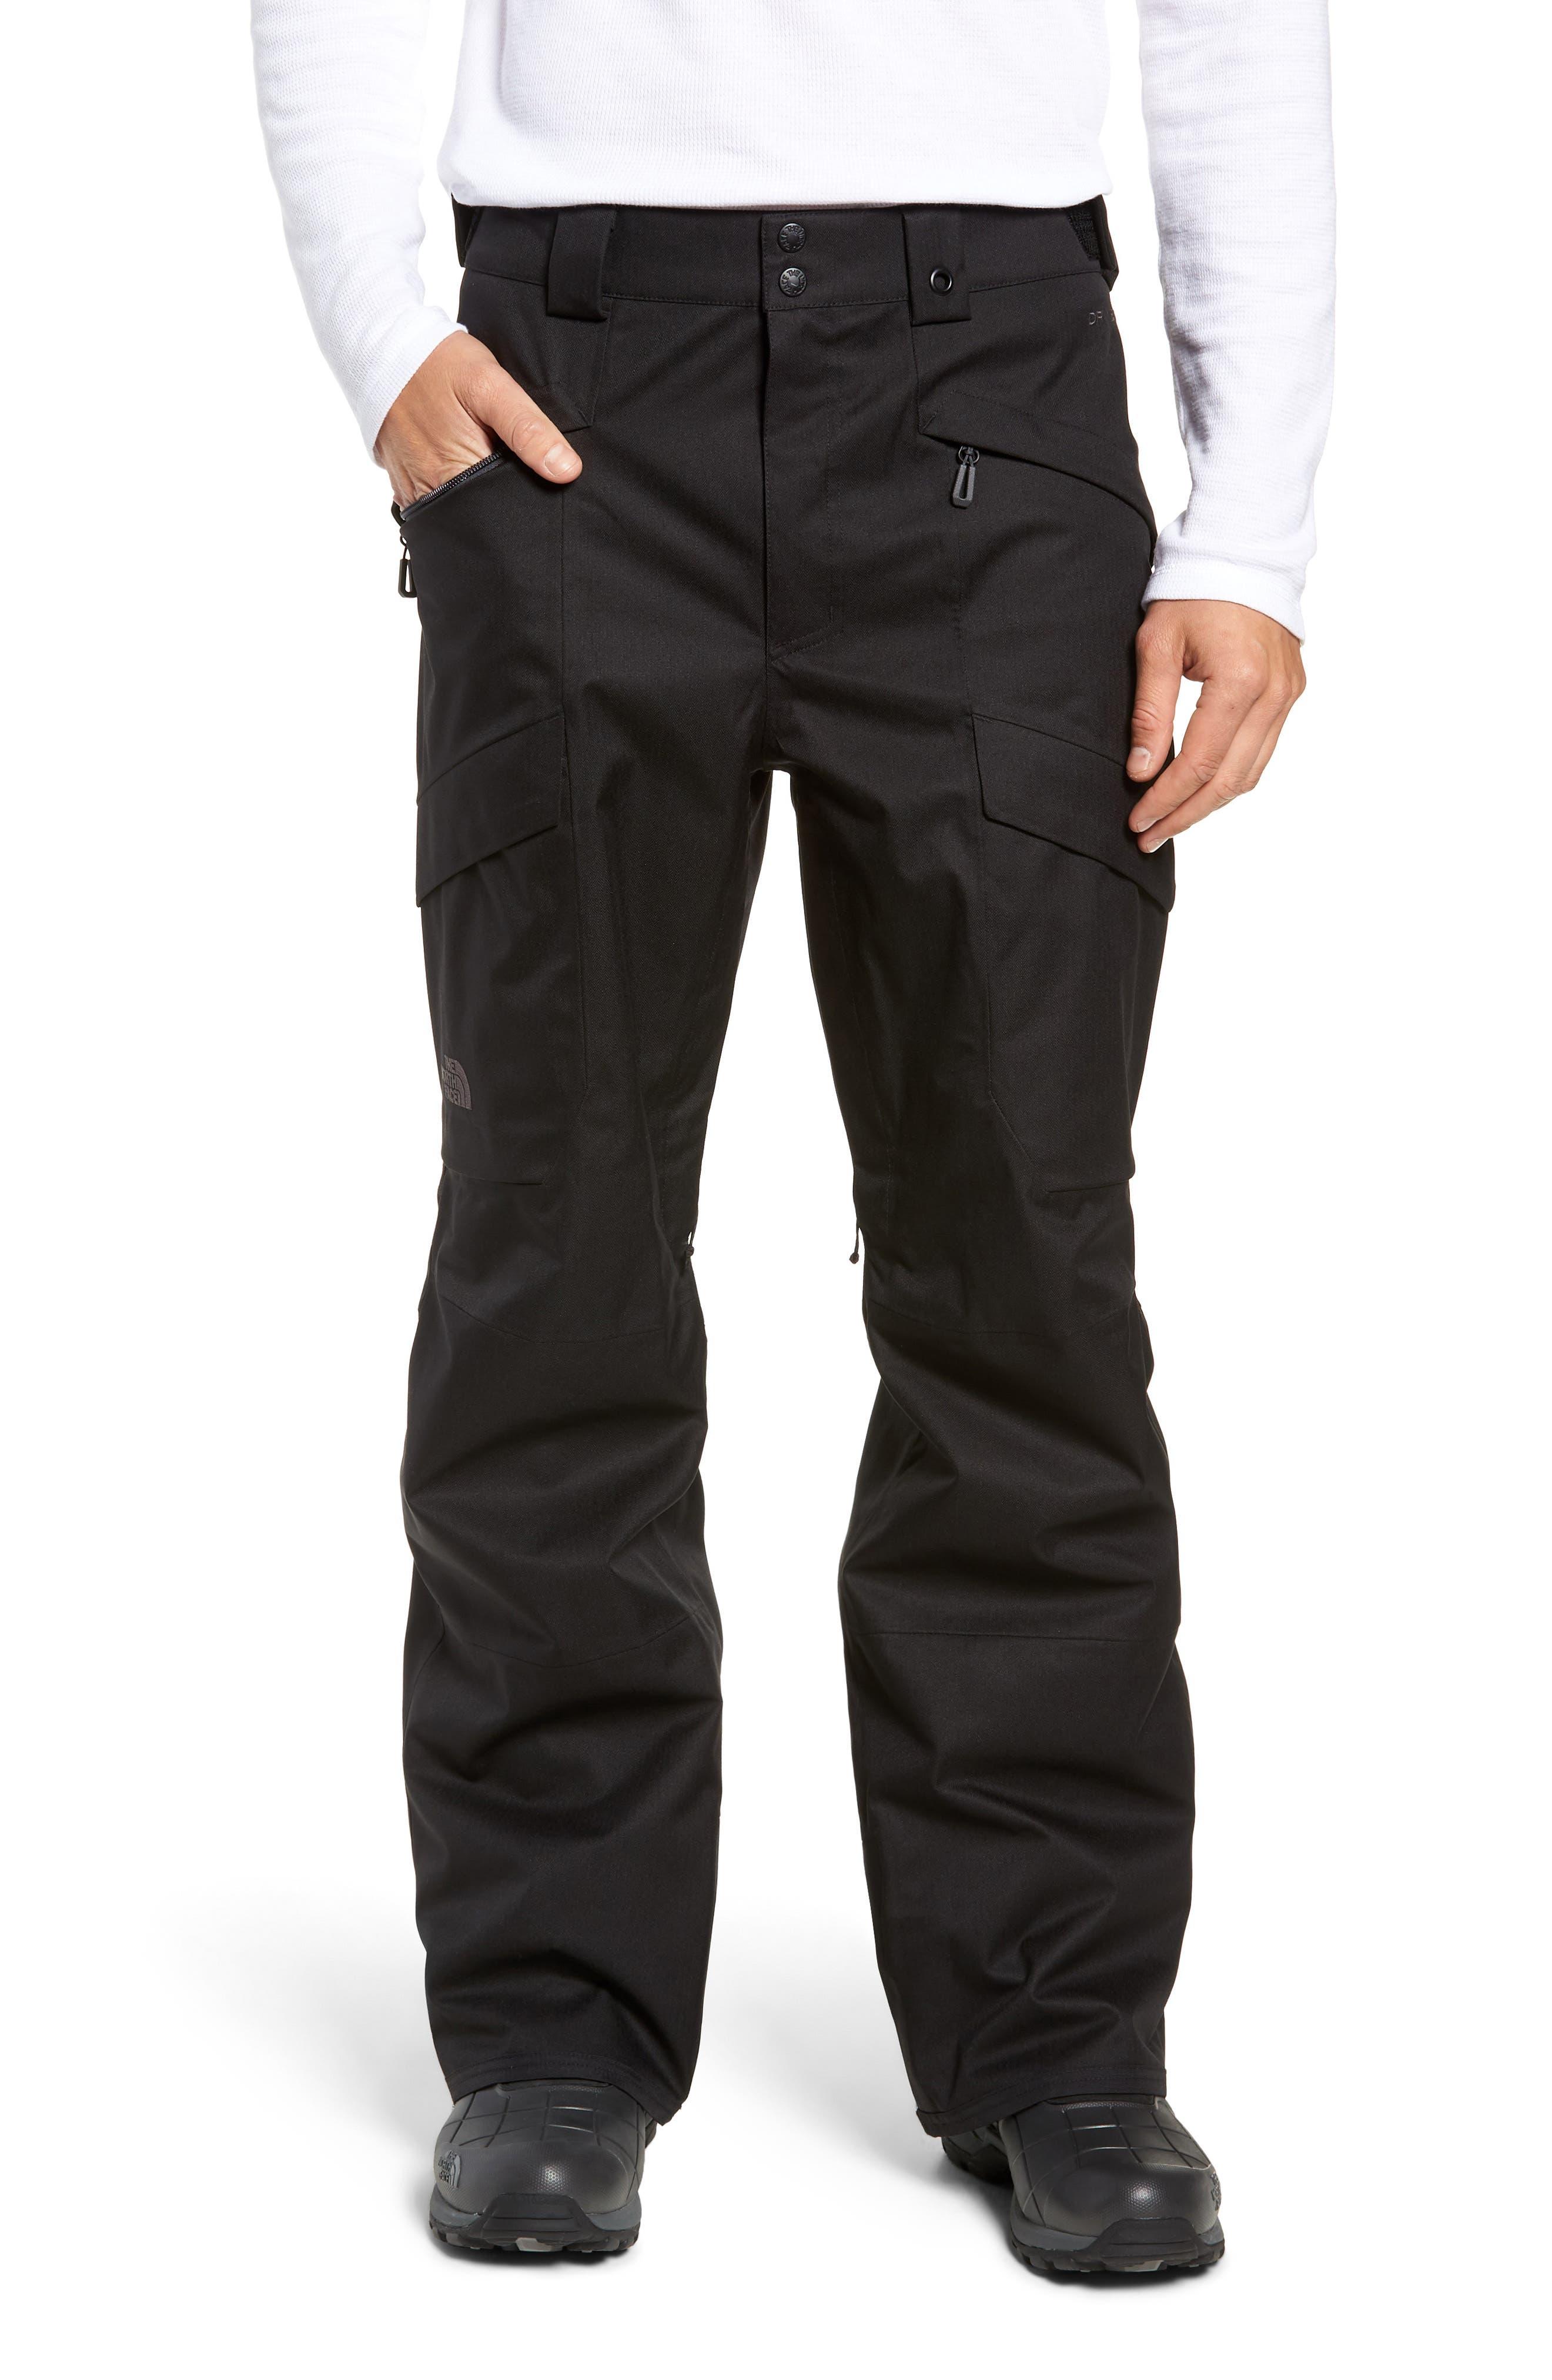 Gatekeeper Waterproof Pants,                         Main,                         color, TNF BLACK/TNF BLACK